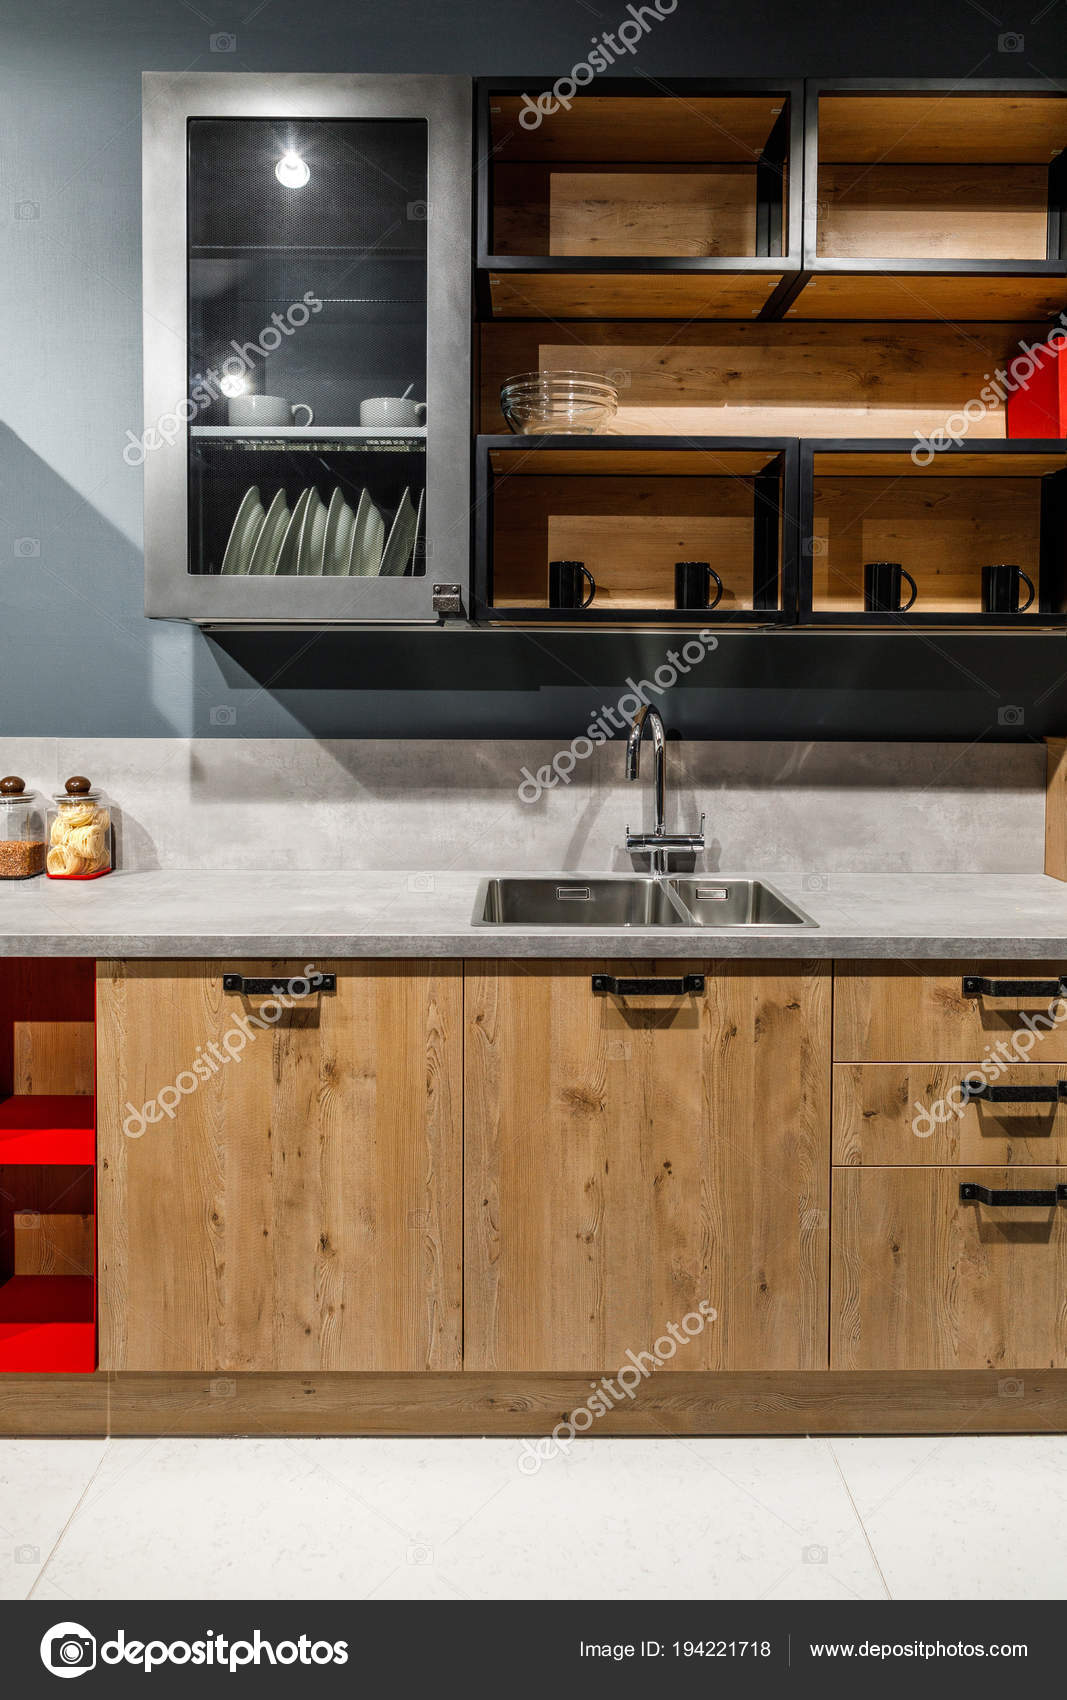 www.kitchen cabinets kitchen chandelier lighting 时尚的厨房与典雅的木制橱柜和火炉 图库照片 c antonmatyukha 194221718